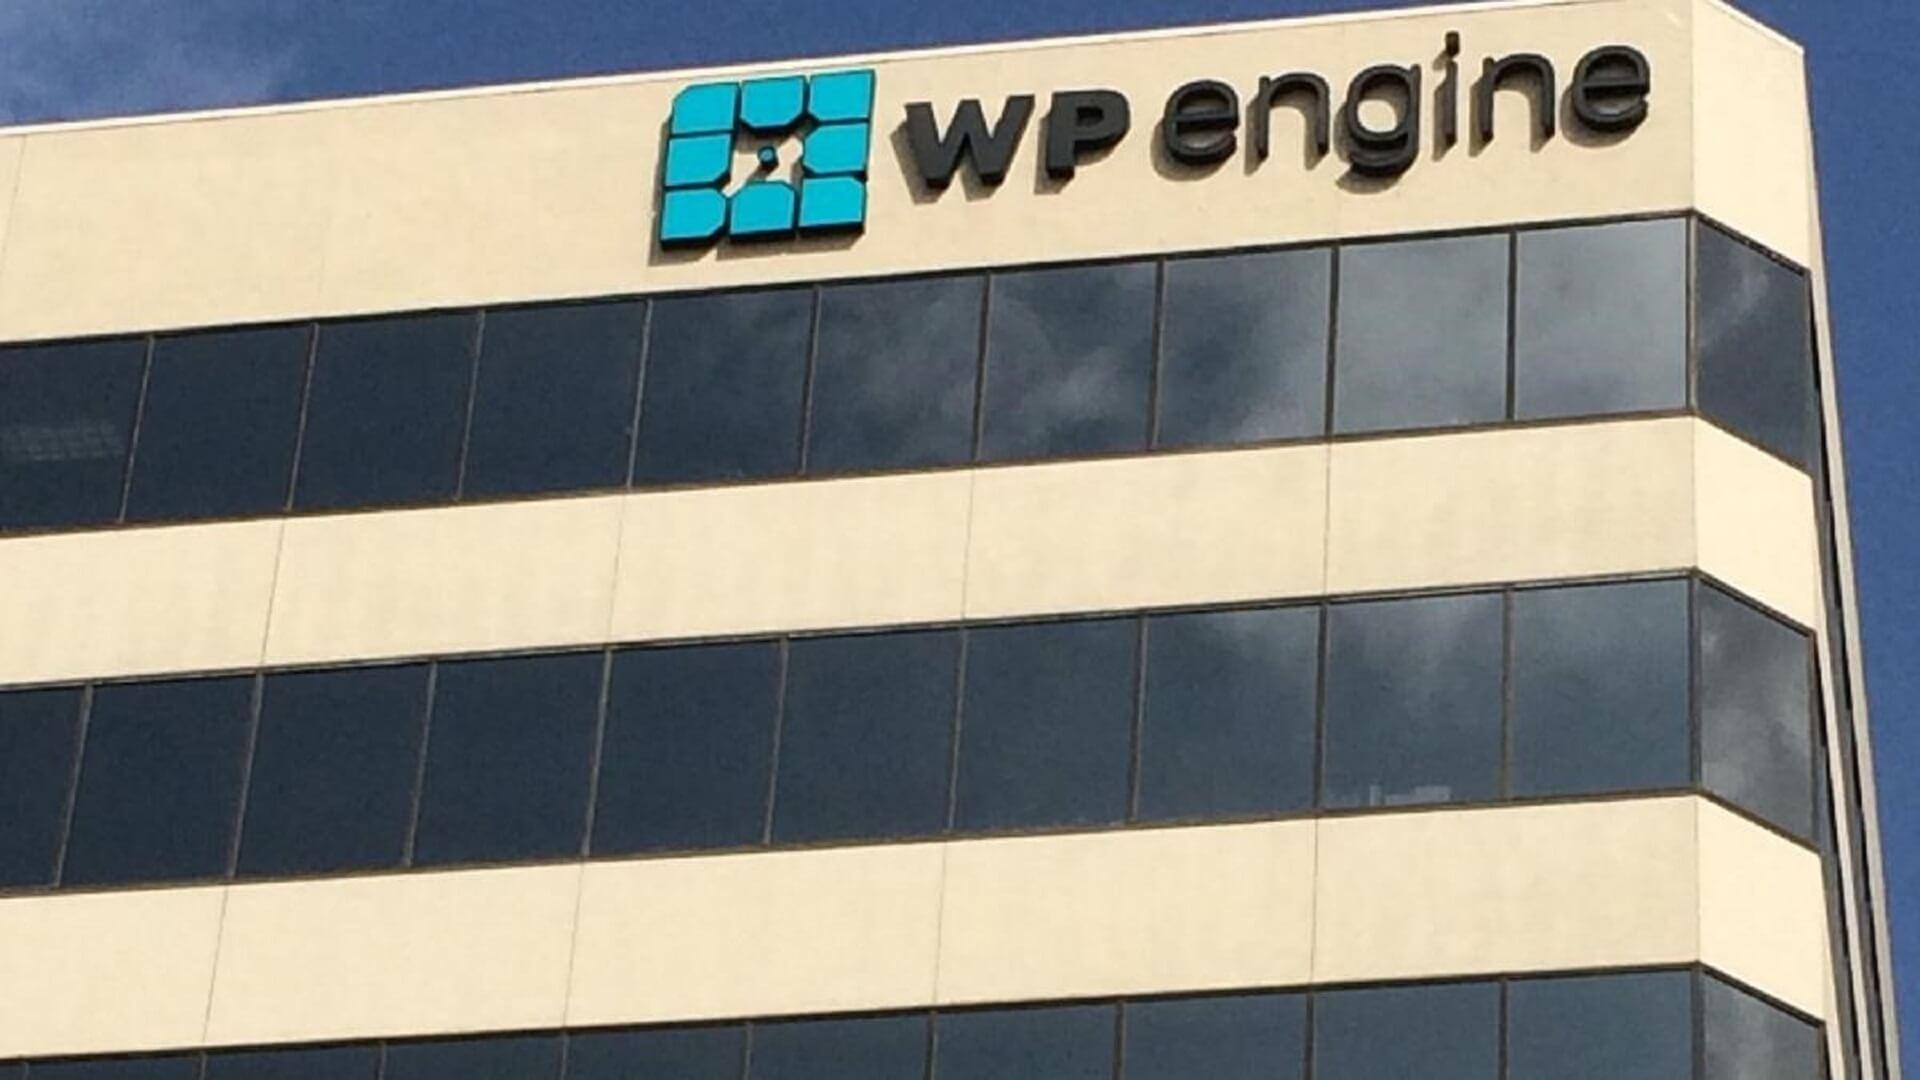 wp-engine-office_1920x1080